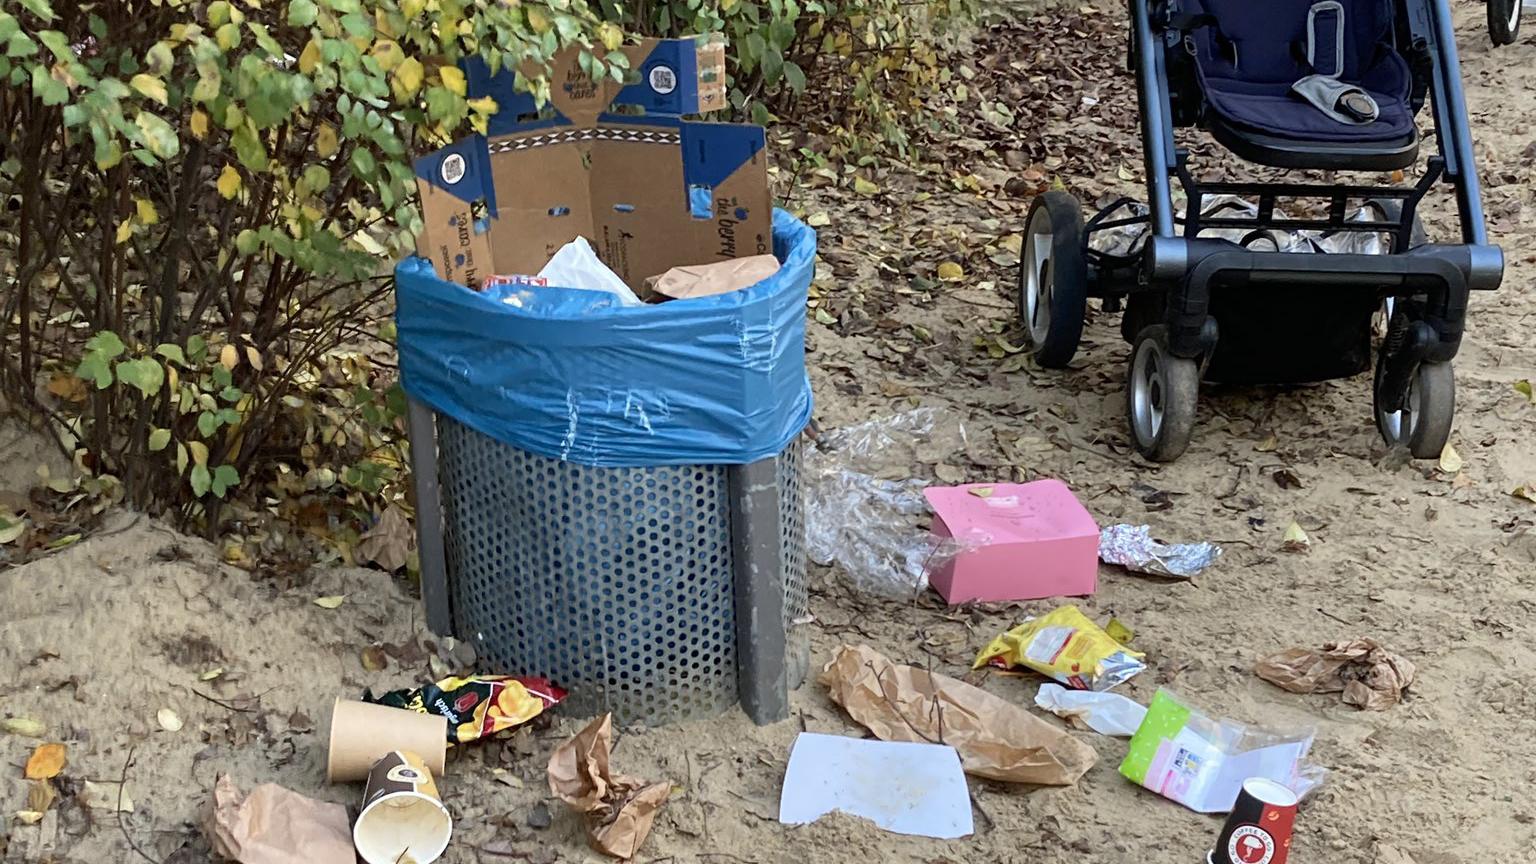 Friedrichshain-Kreuzberg: Zäune gegen verschmutzte Spielplätze